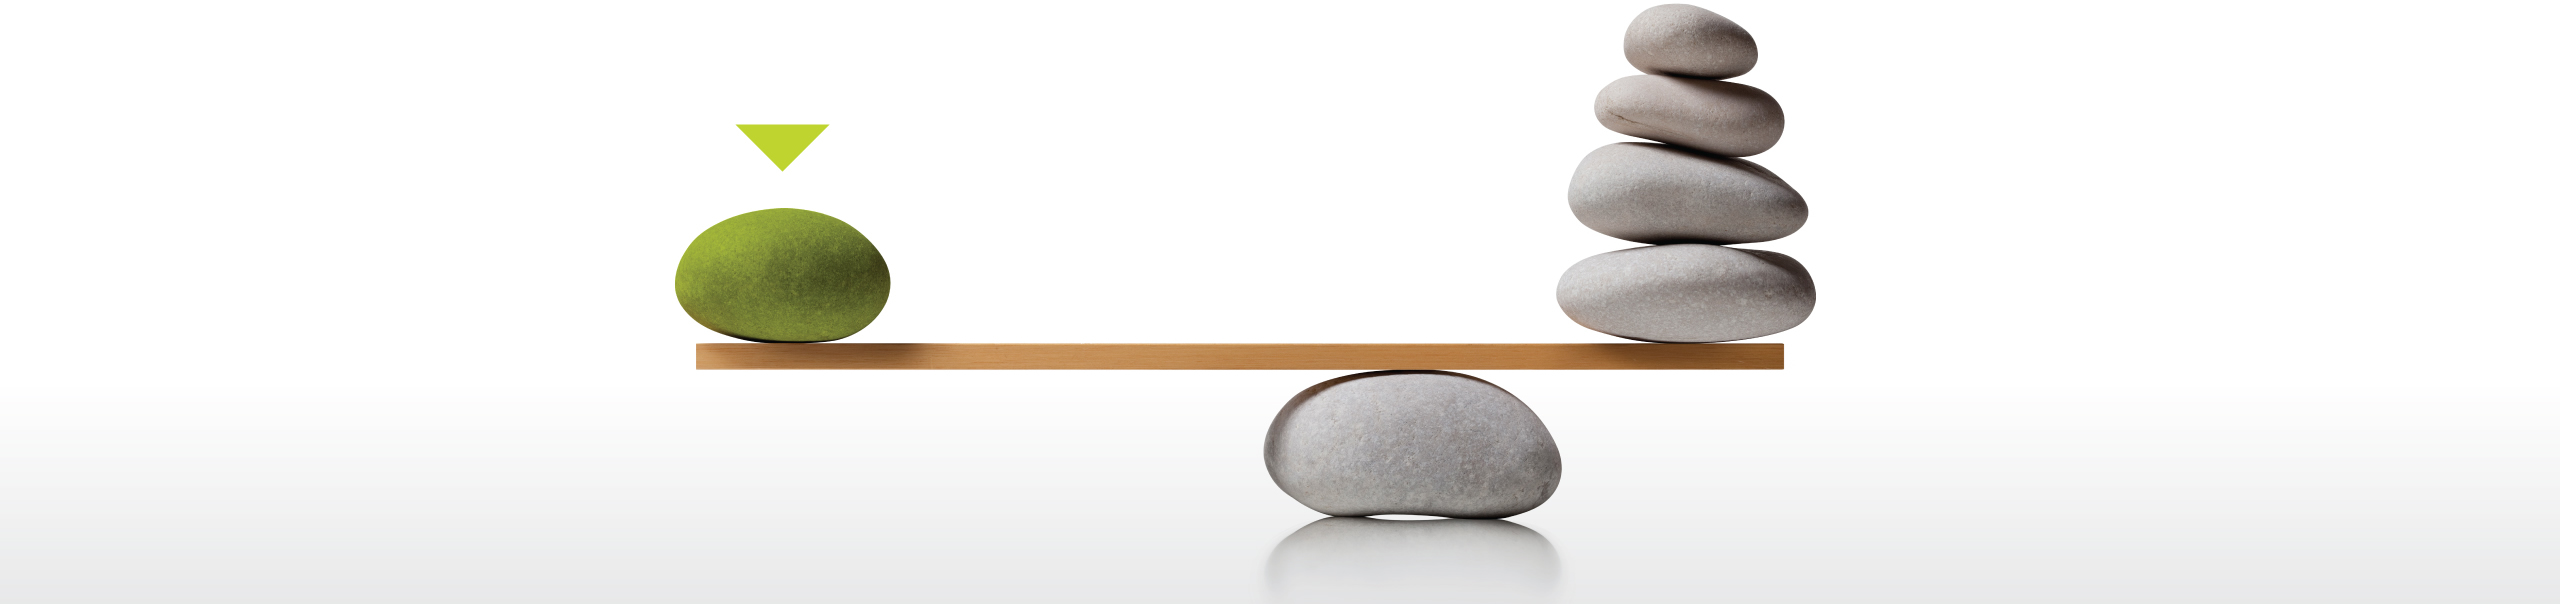 balance-rocks-wide